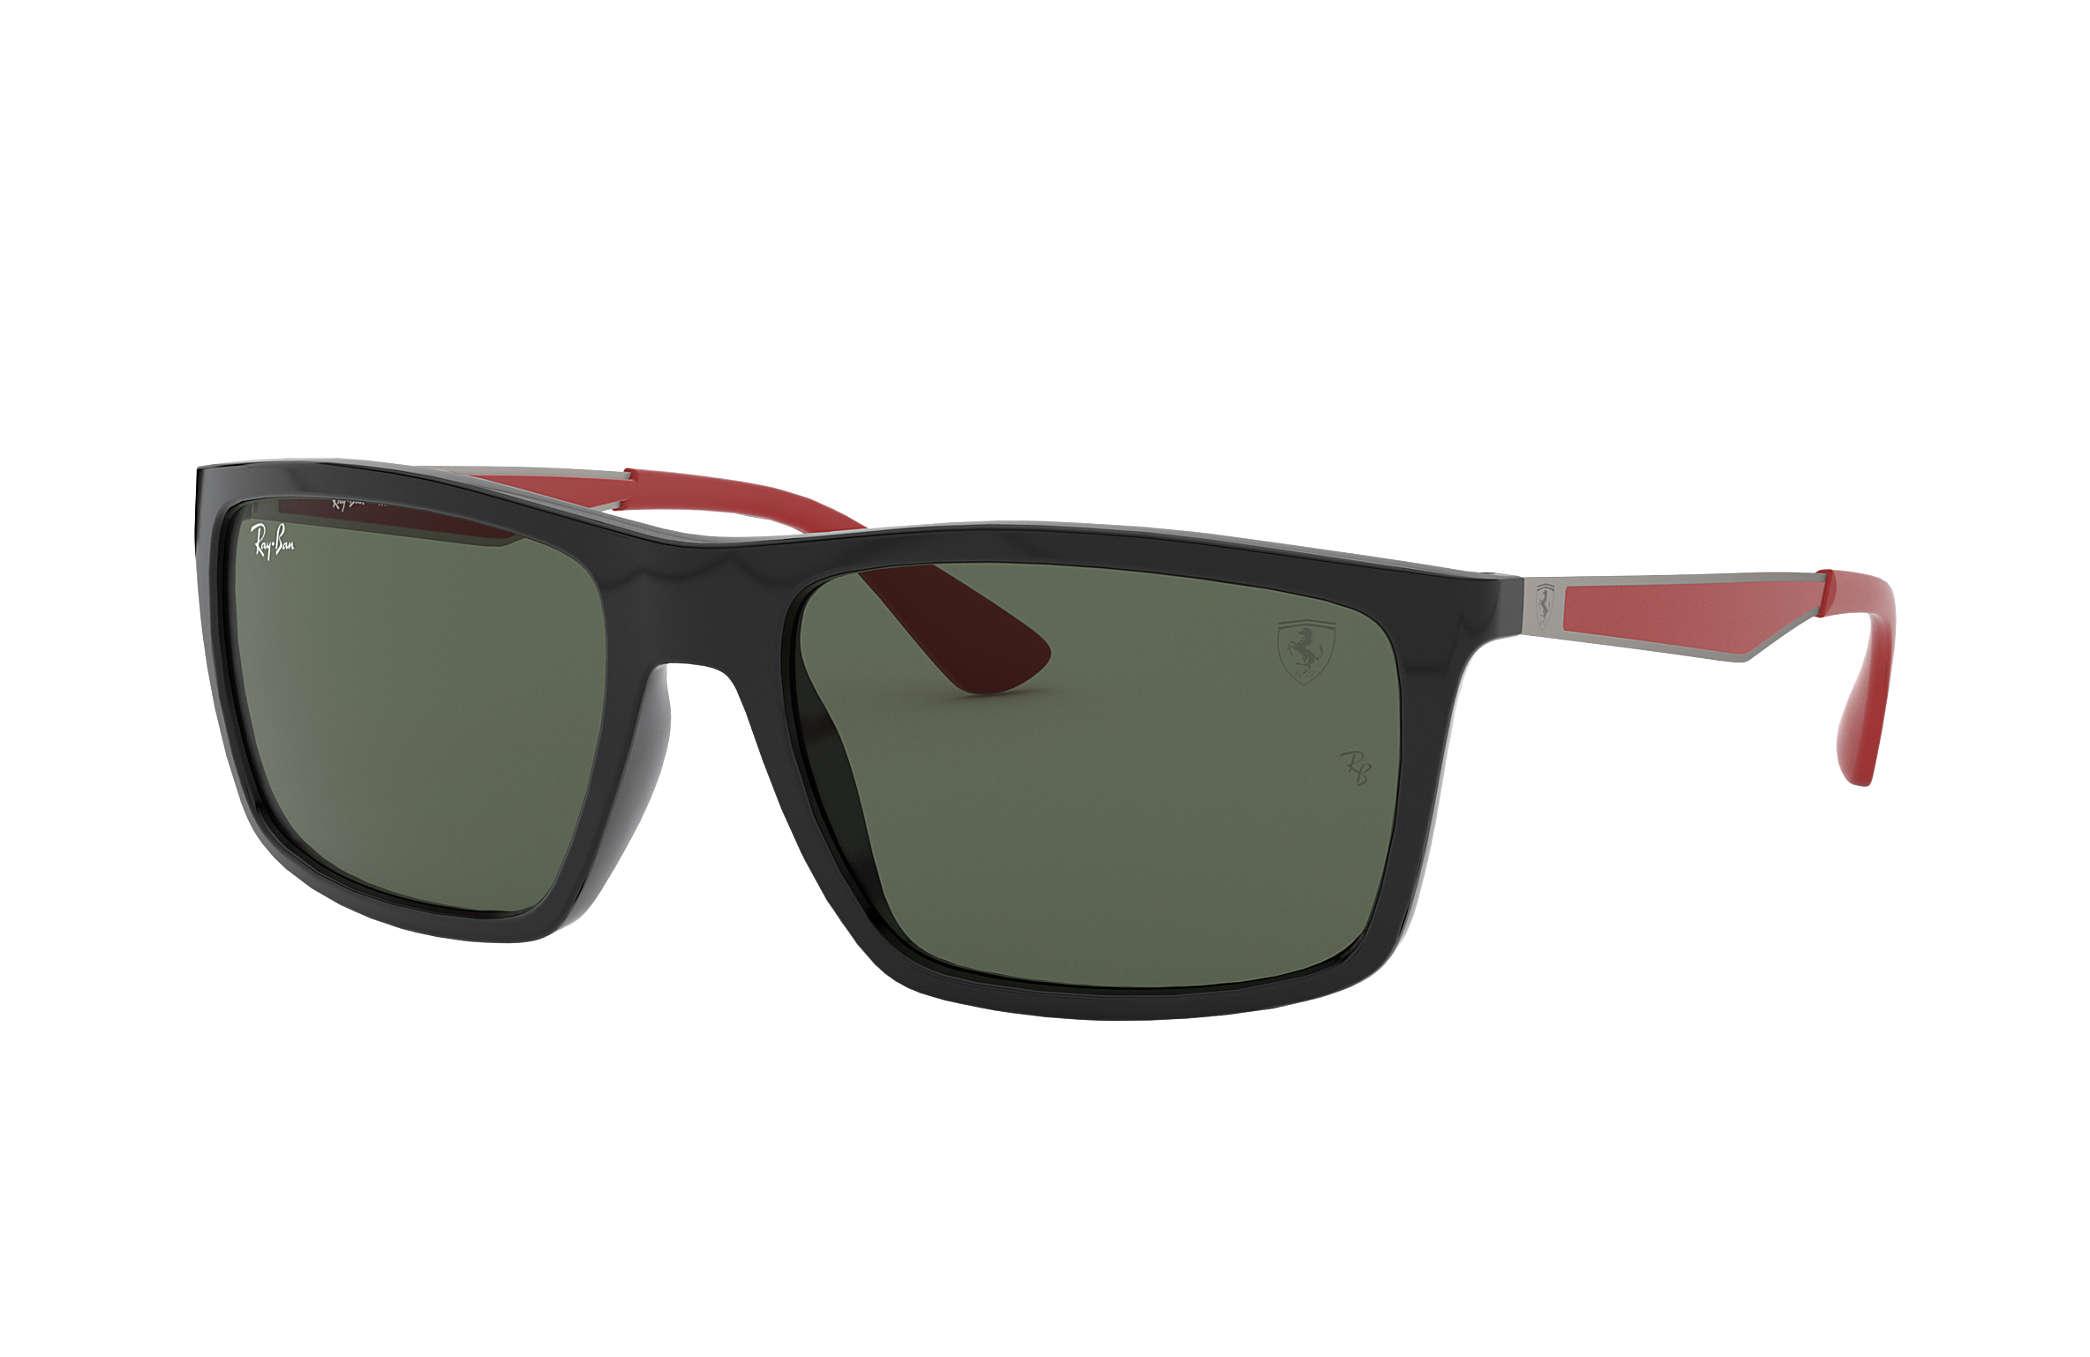 Ray ban sunglasses new design - Ferrari Ray Ban